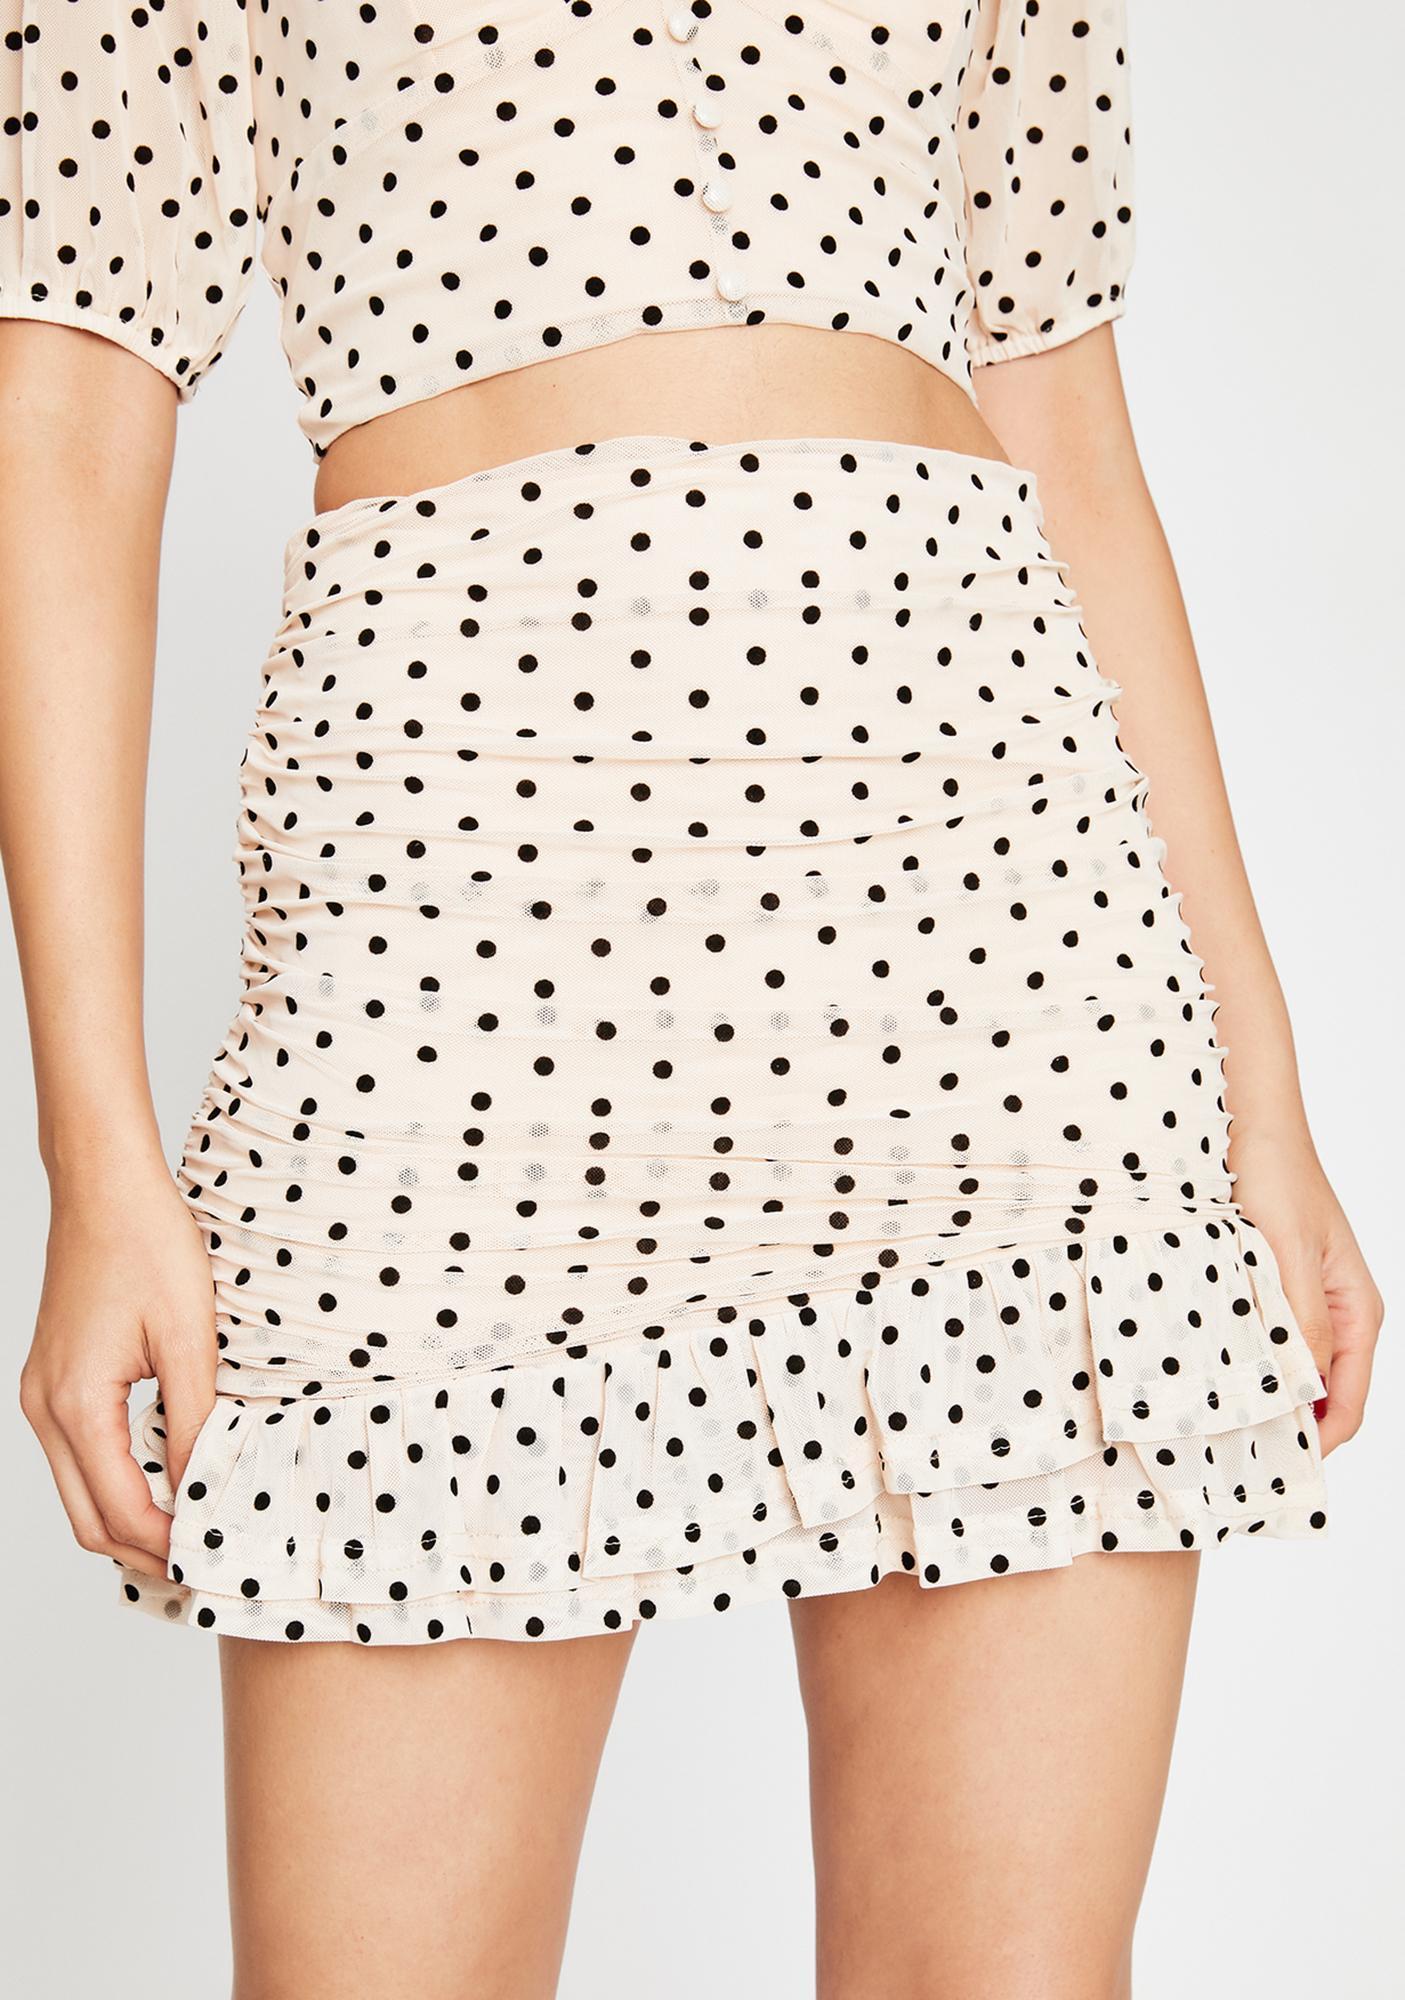 Re Named Not So Subtle Ruched Skirt